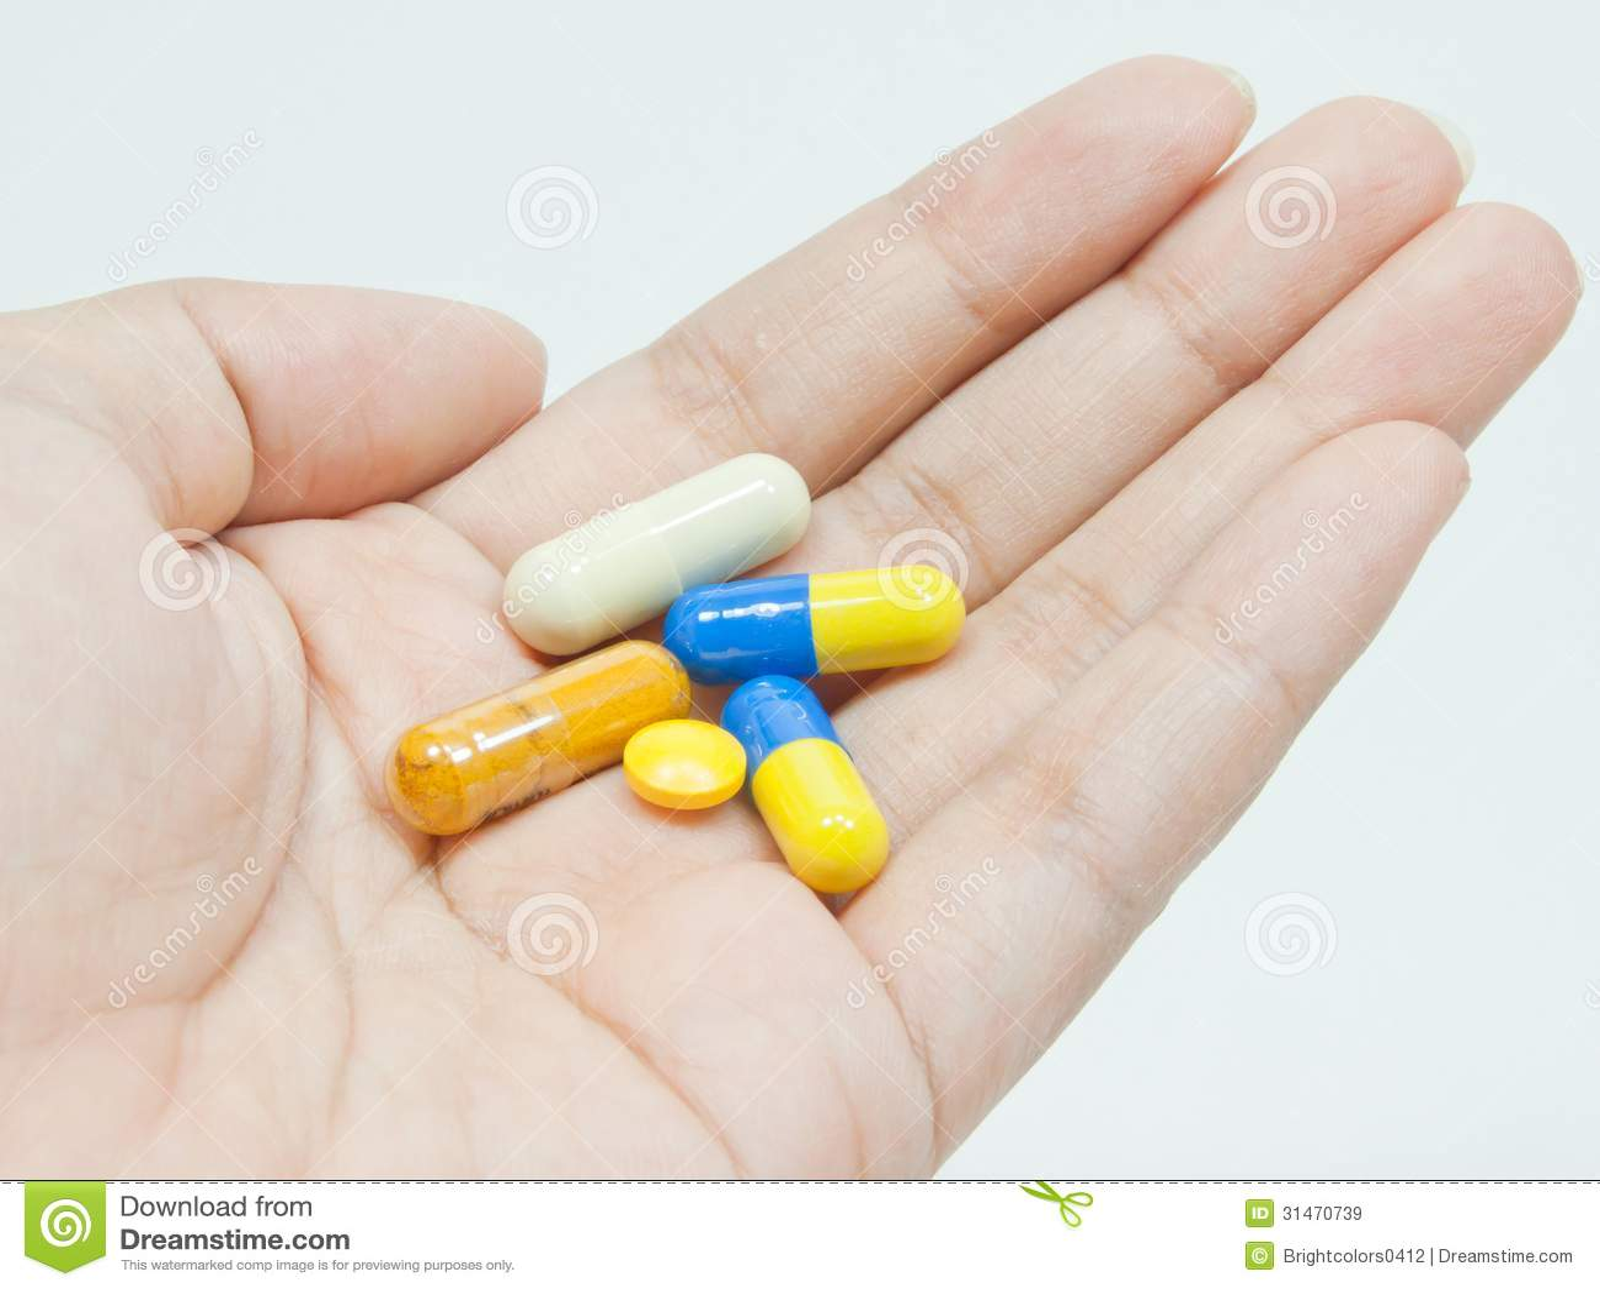 Take a medicine stock image. Image of medicine, medical ...